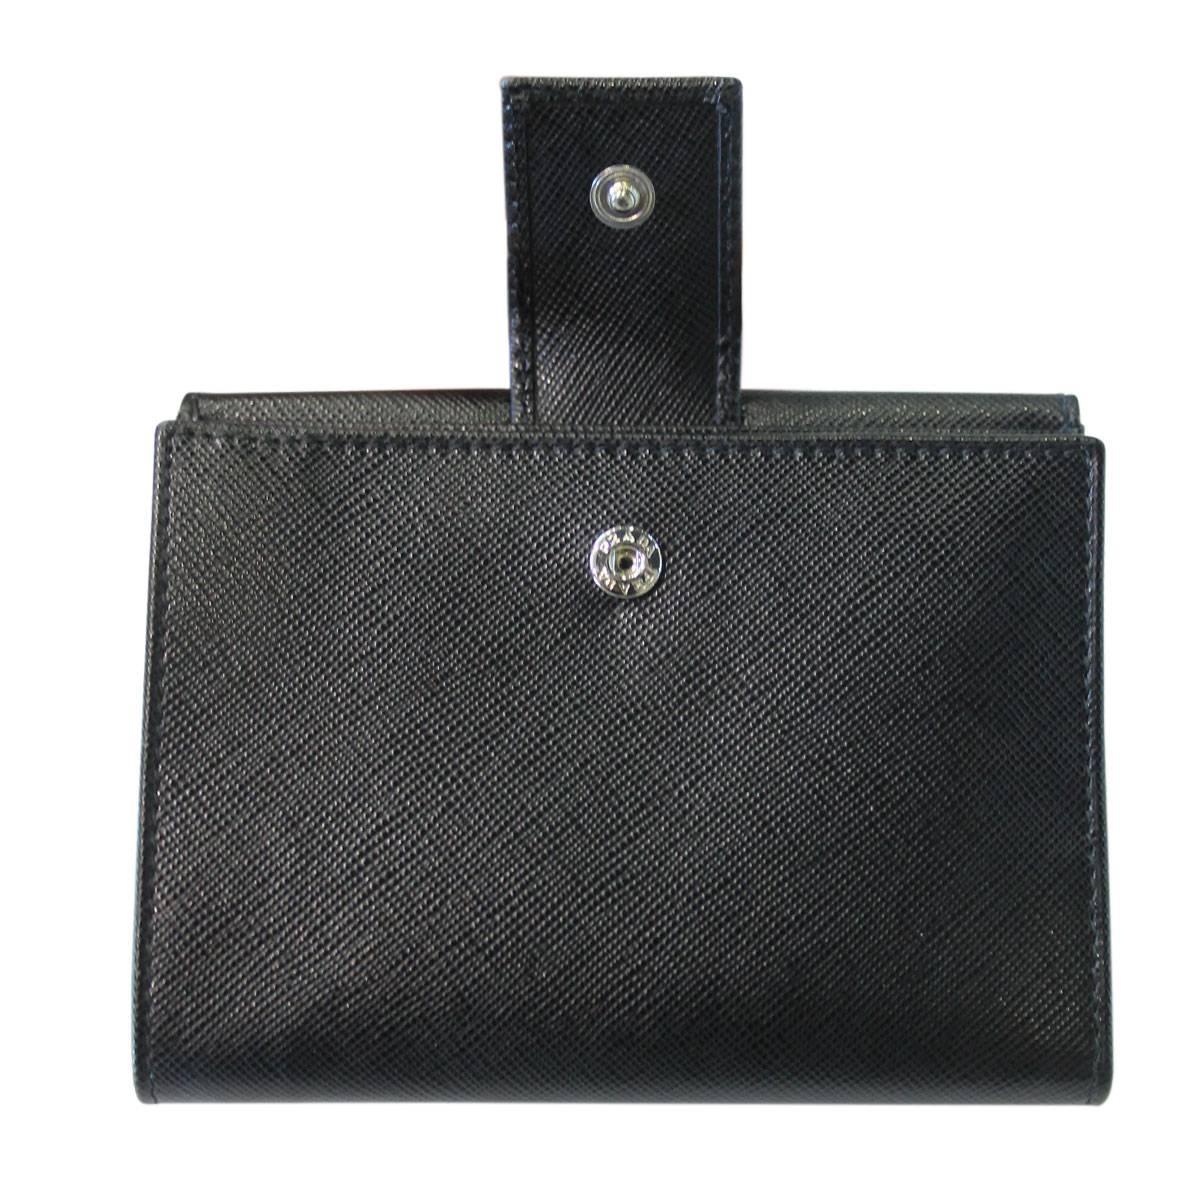 f9f1597cf2 Prada Small Saffiano Leather Wallet